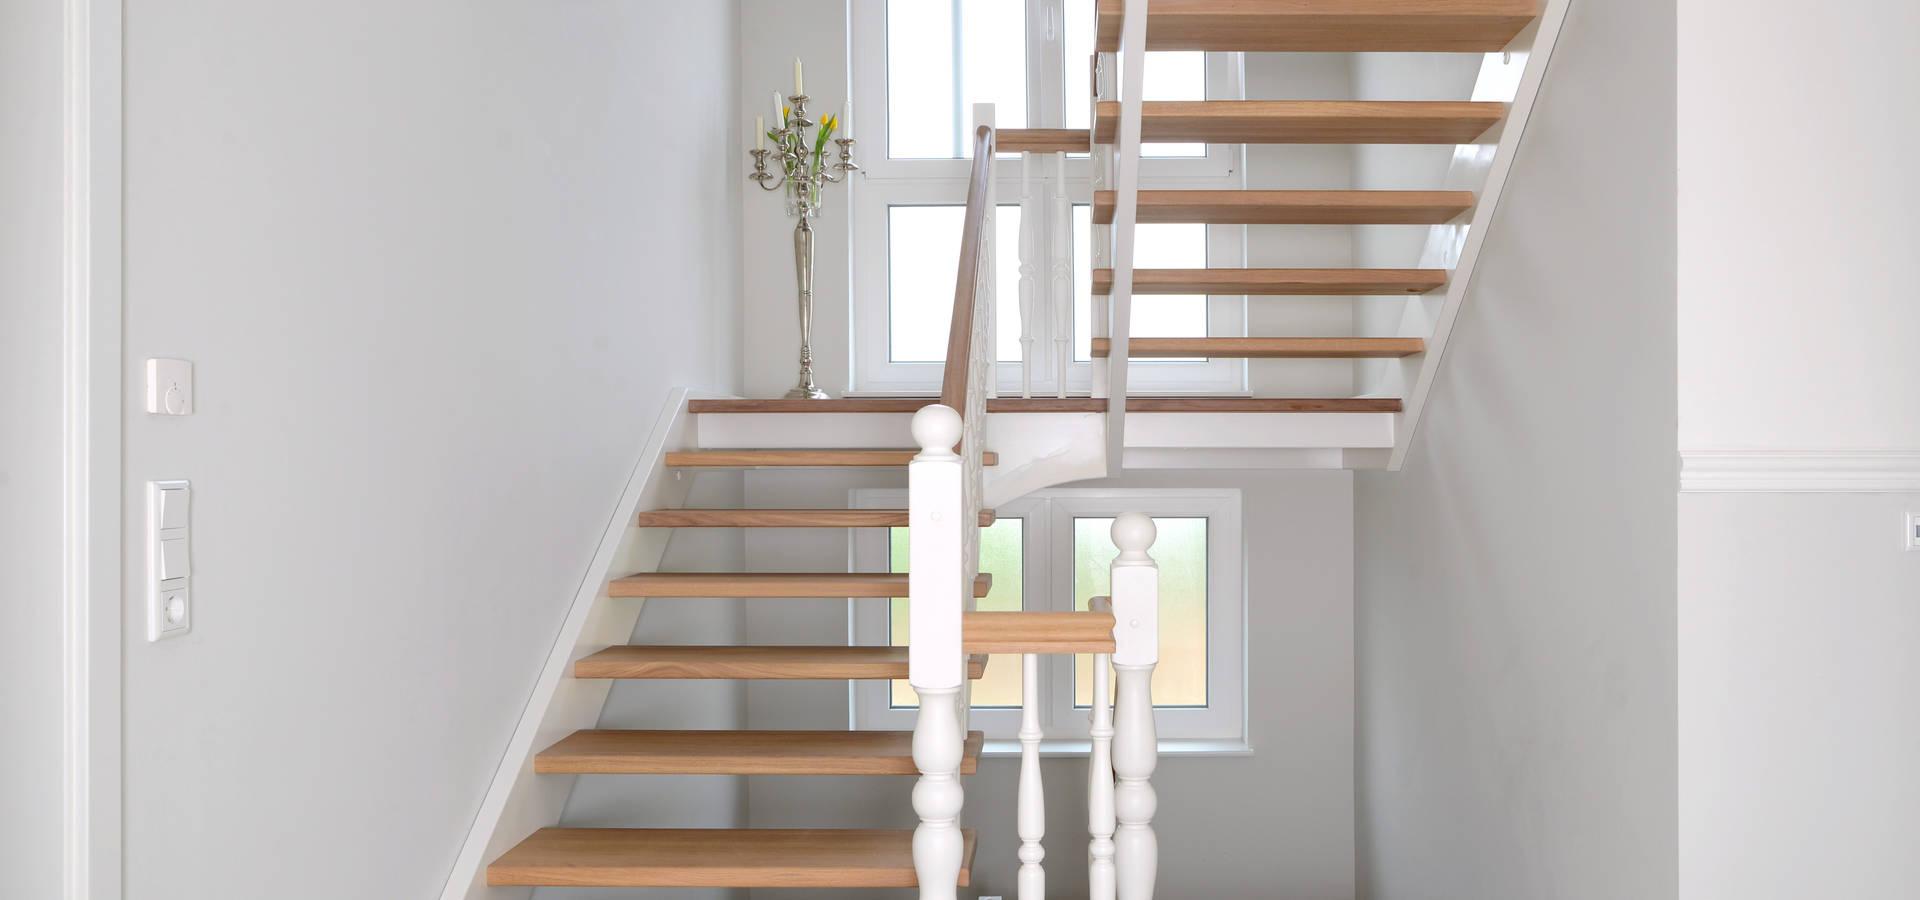 wundersch nen betontreppe mit holzstufen haus design ideen. Black Bedroom Furniture Sets. Home Design Ideas